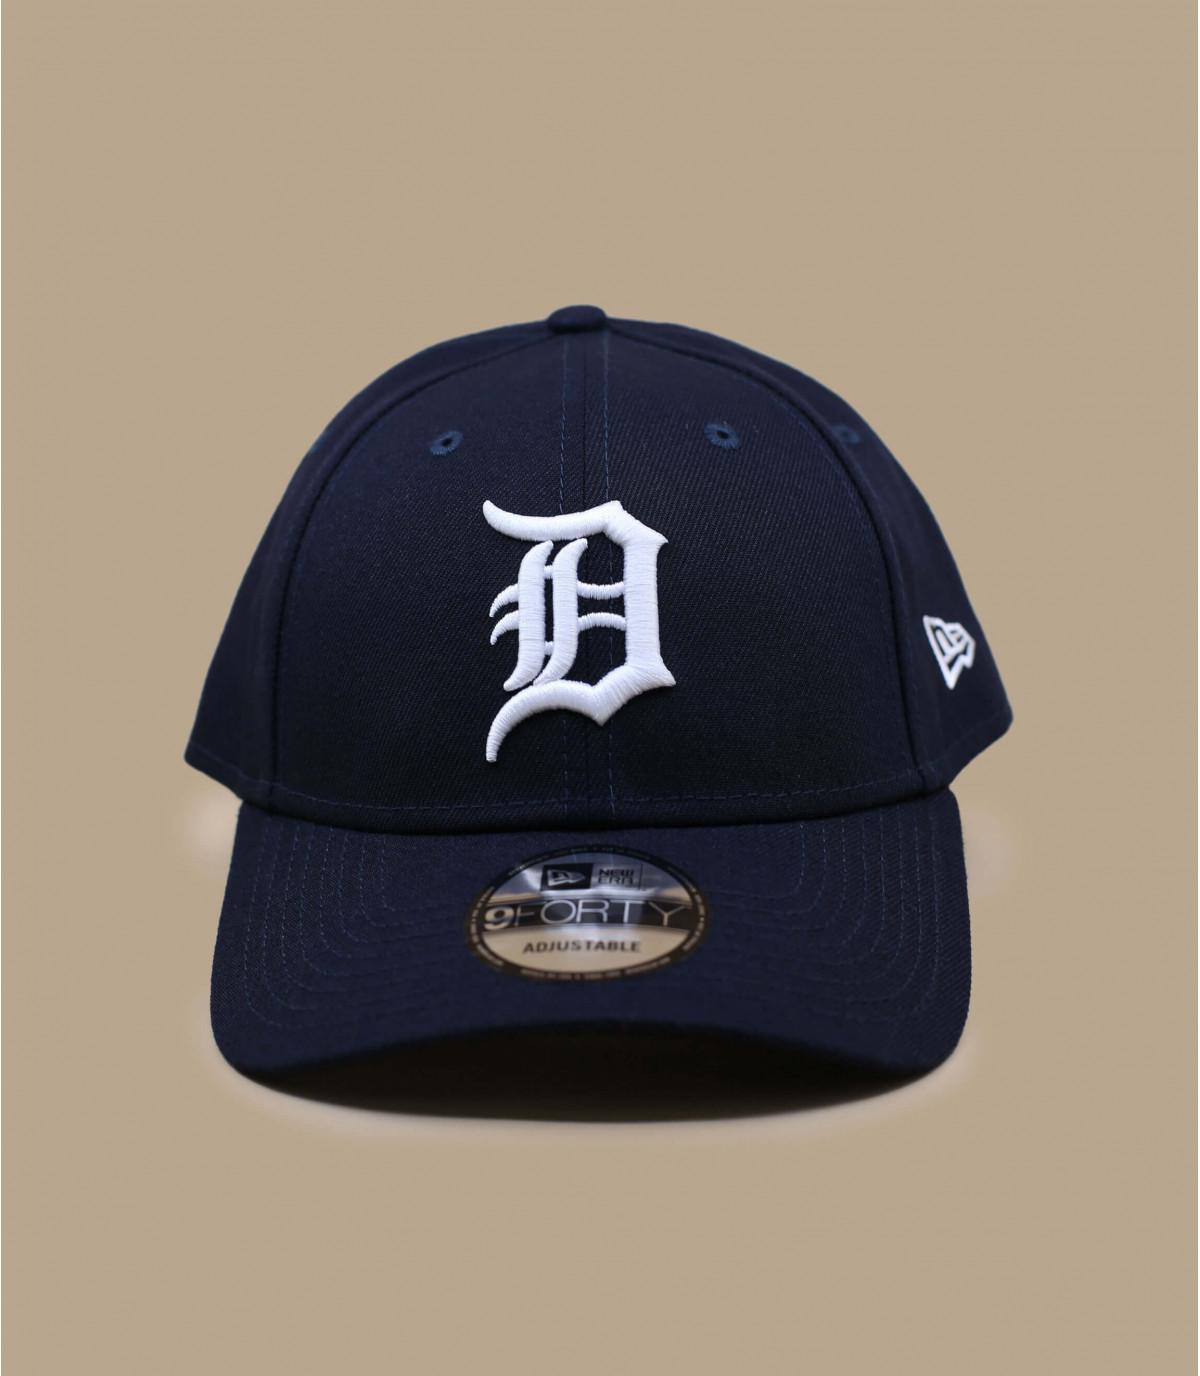 Detroit Tiger baseball cap